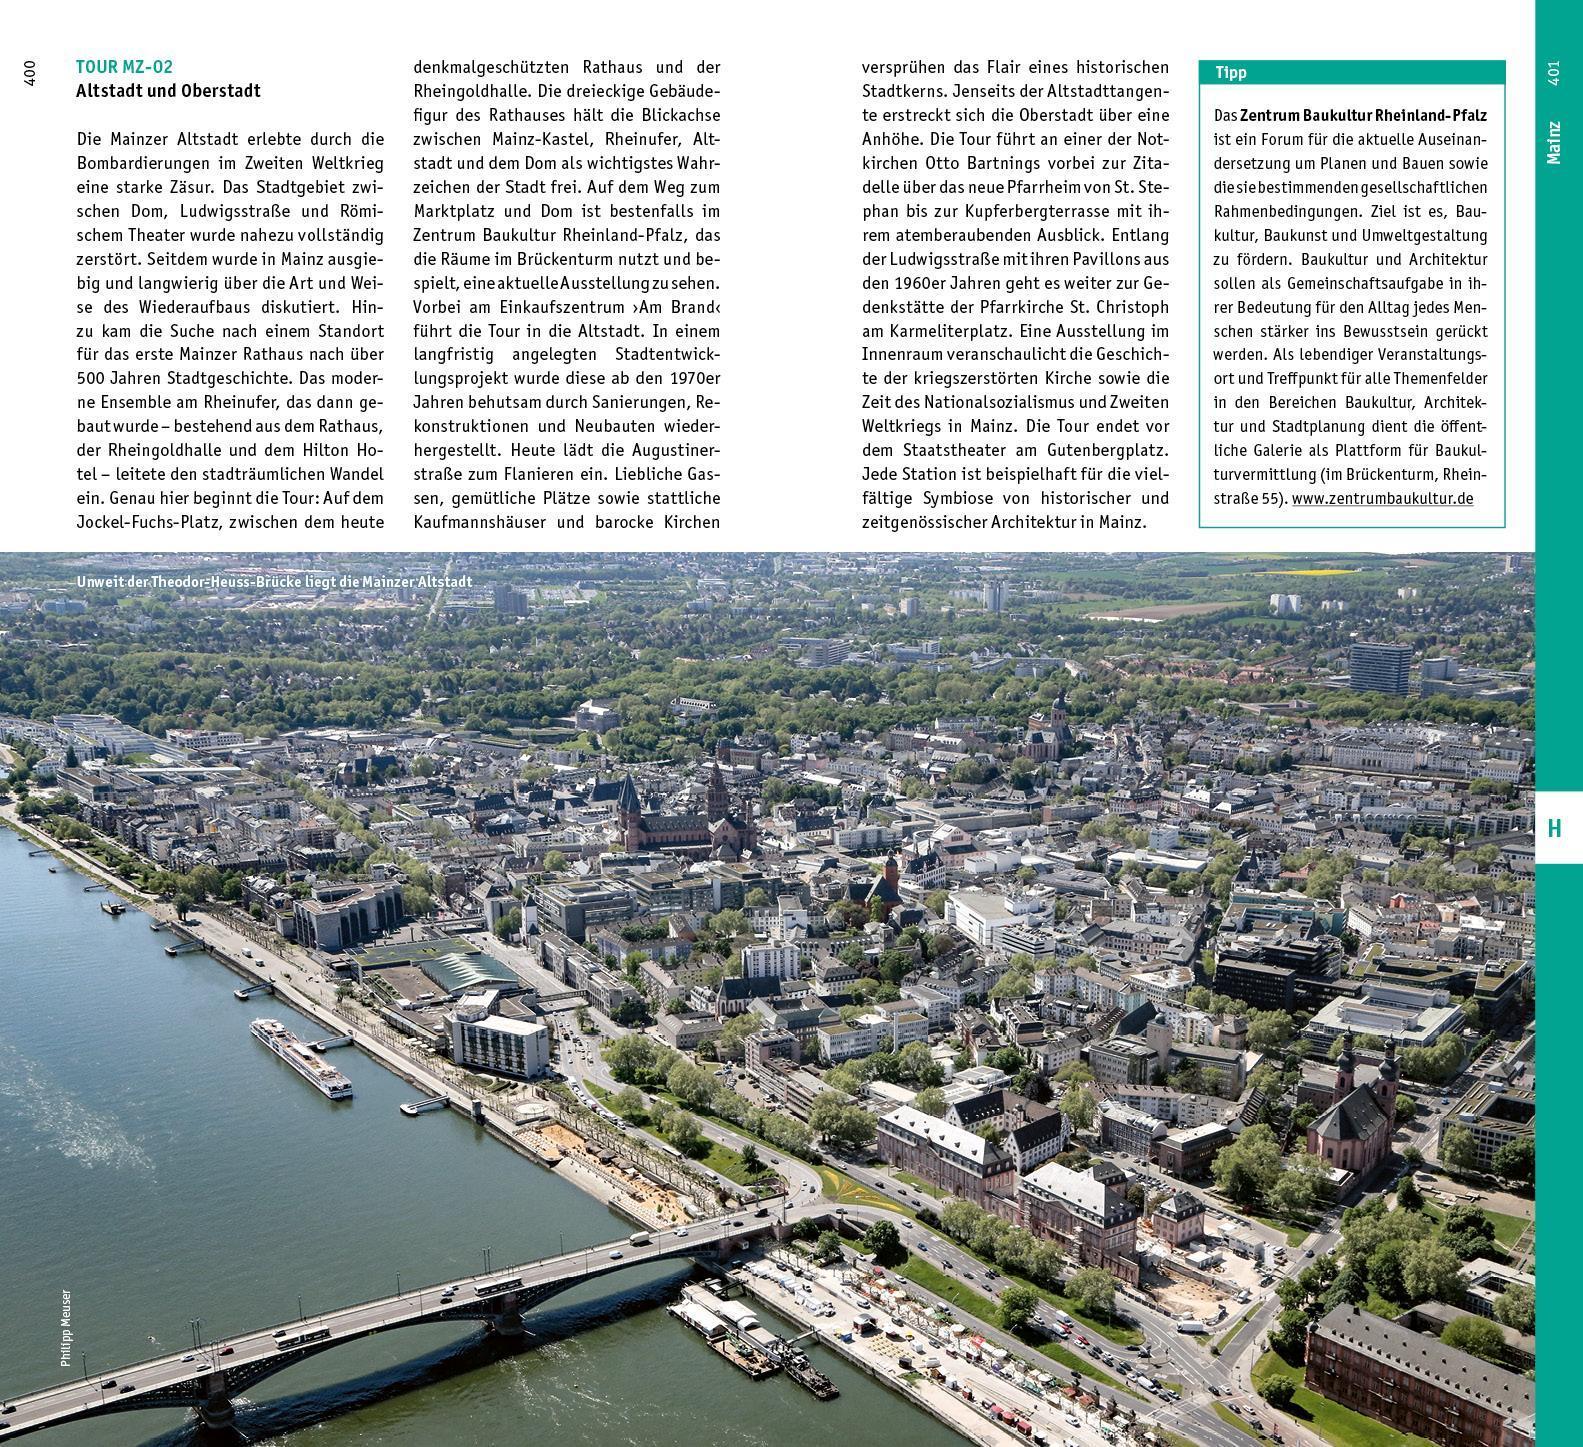 Architekturführer Metropolregion Frankfurt Rhein Main